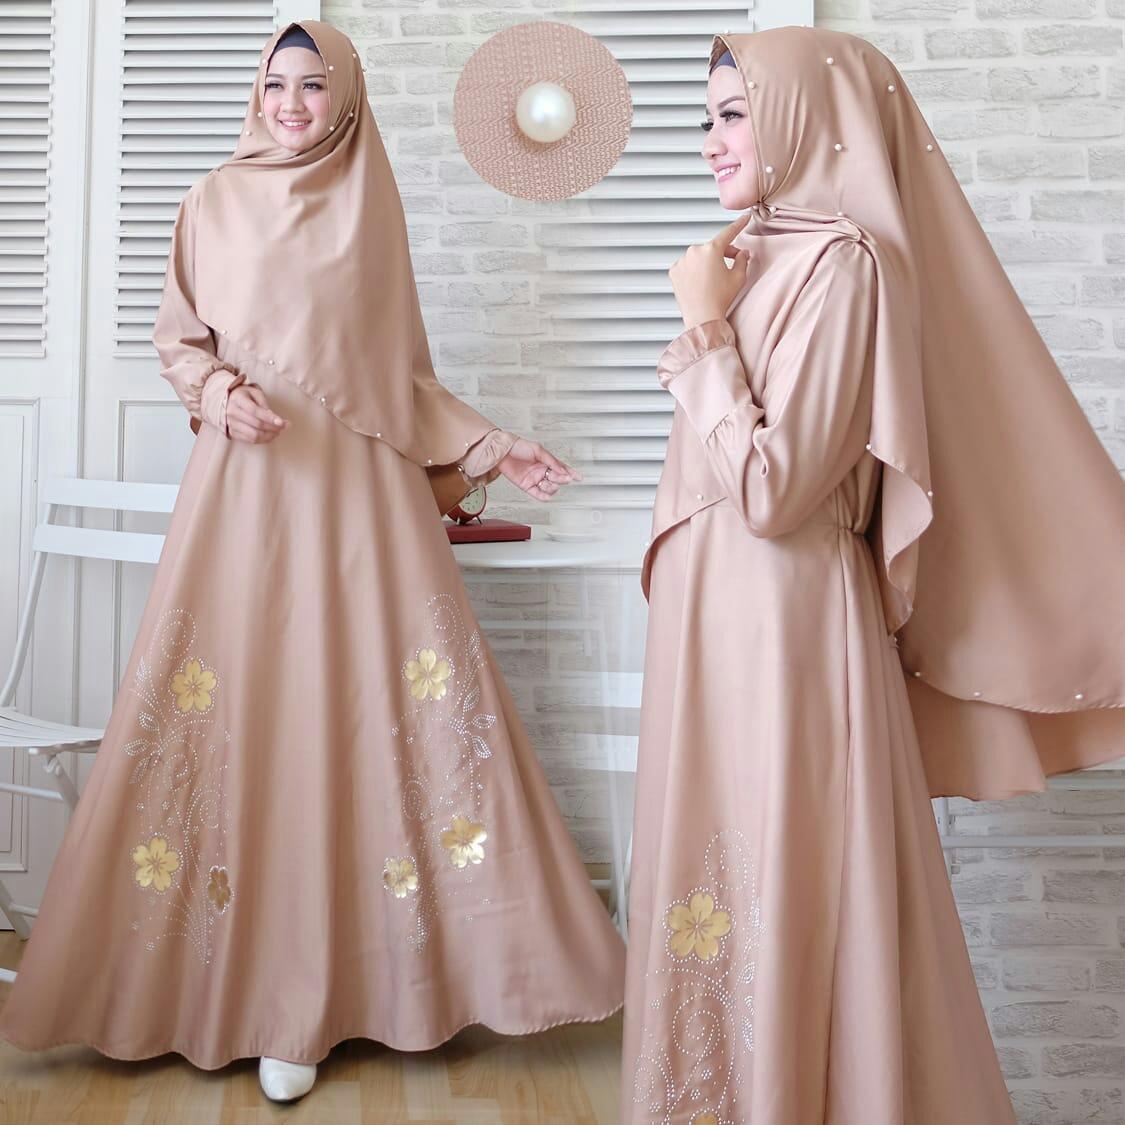 Baju Muslim Wanita Gamis Modern Terbaru Maxi Emma 23 Gamia Model Kekinian Janela Syari Umbrella Real Pict